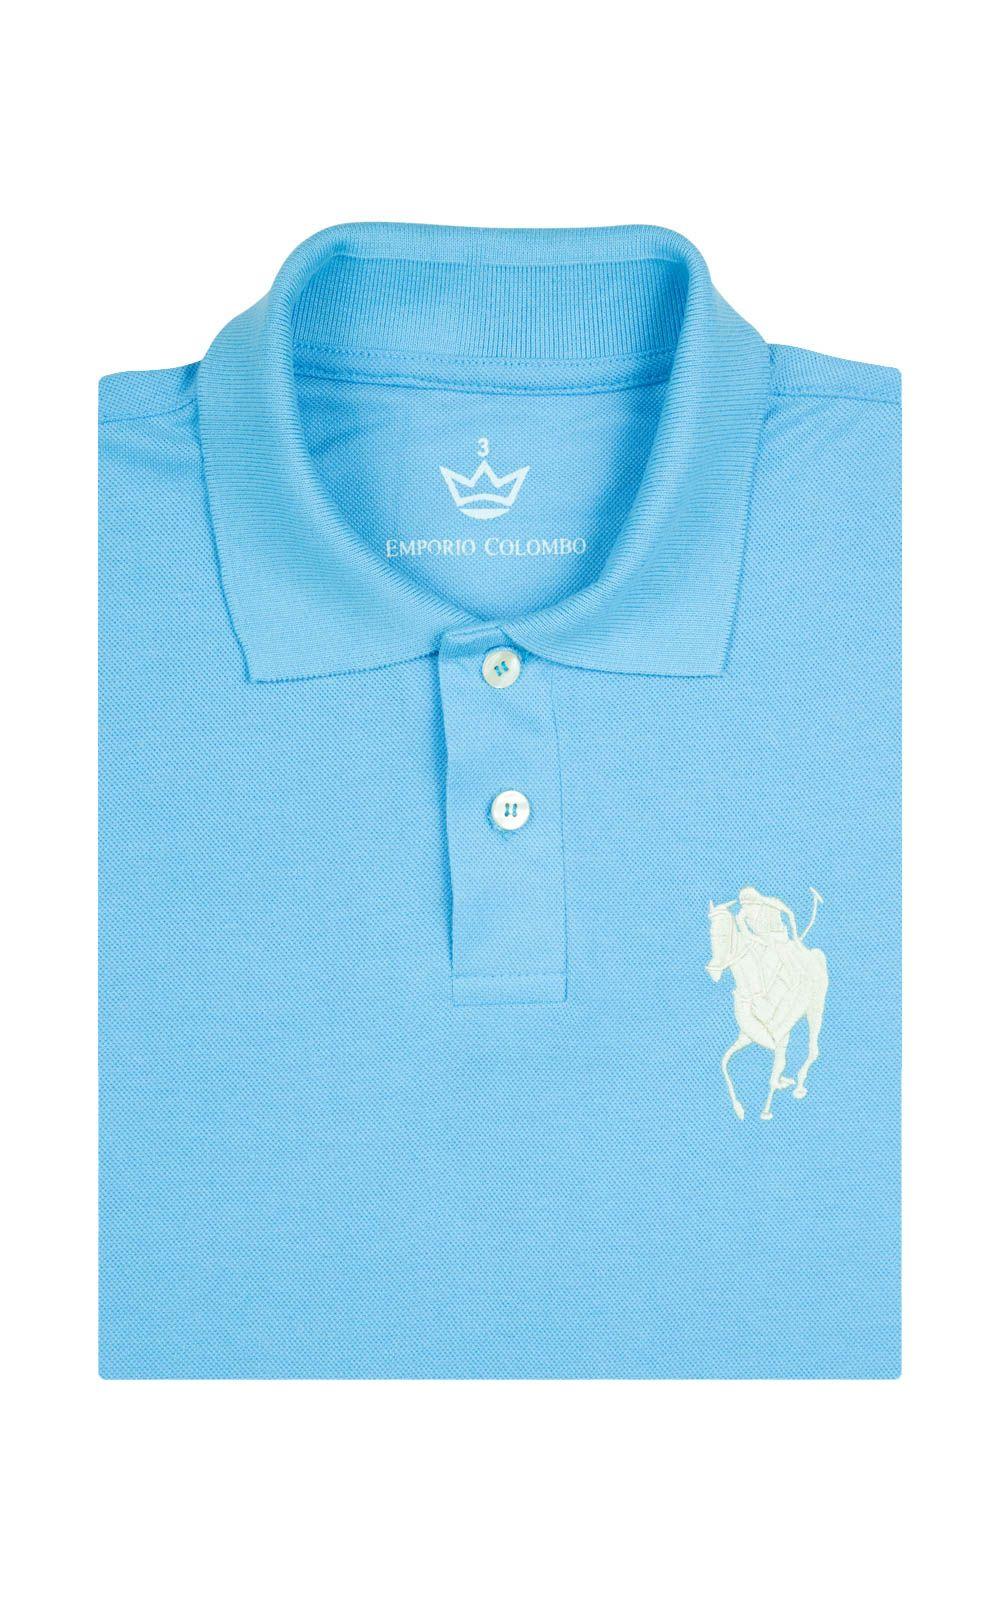 Foto 4 - Camisa Polo Masculina Azul Claro Bordada